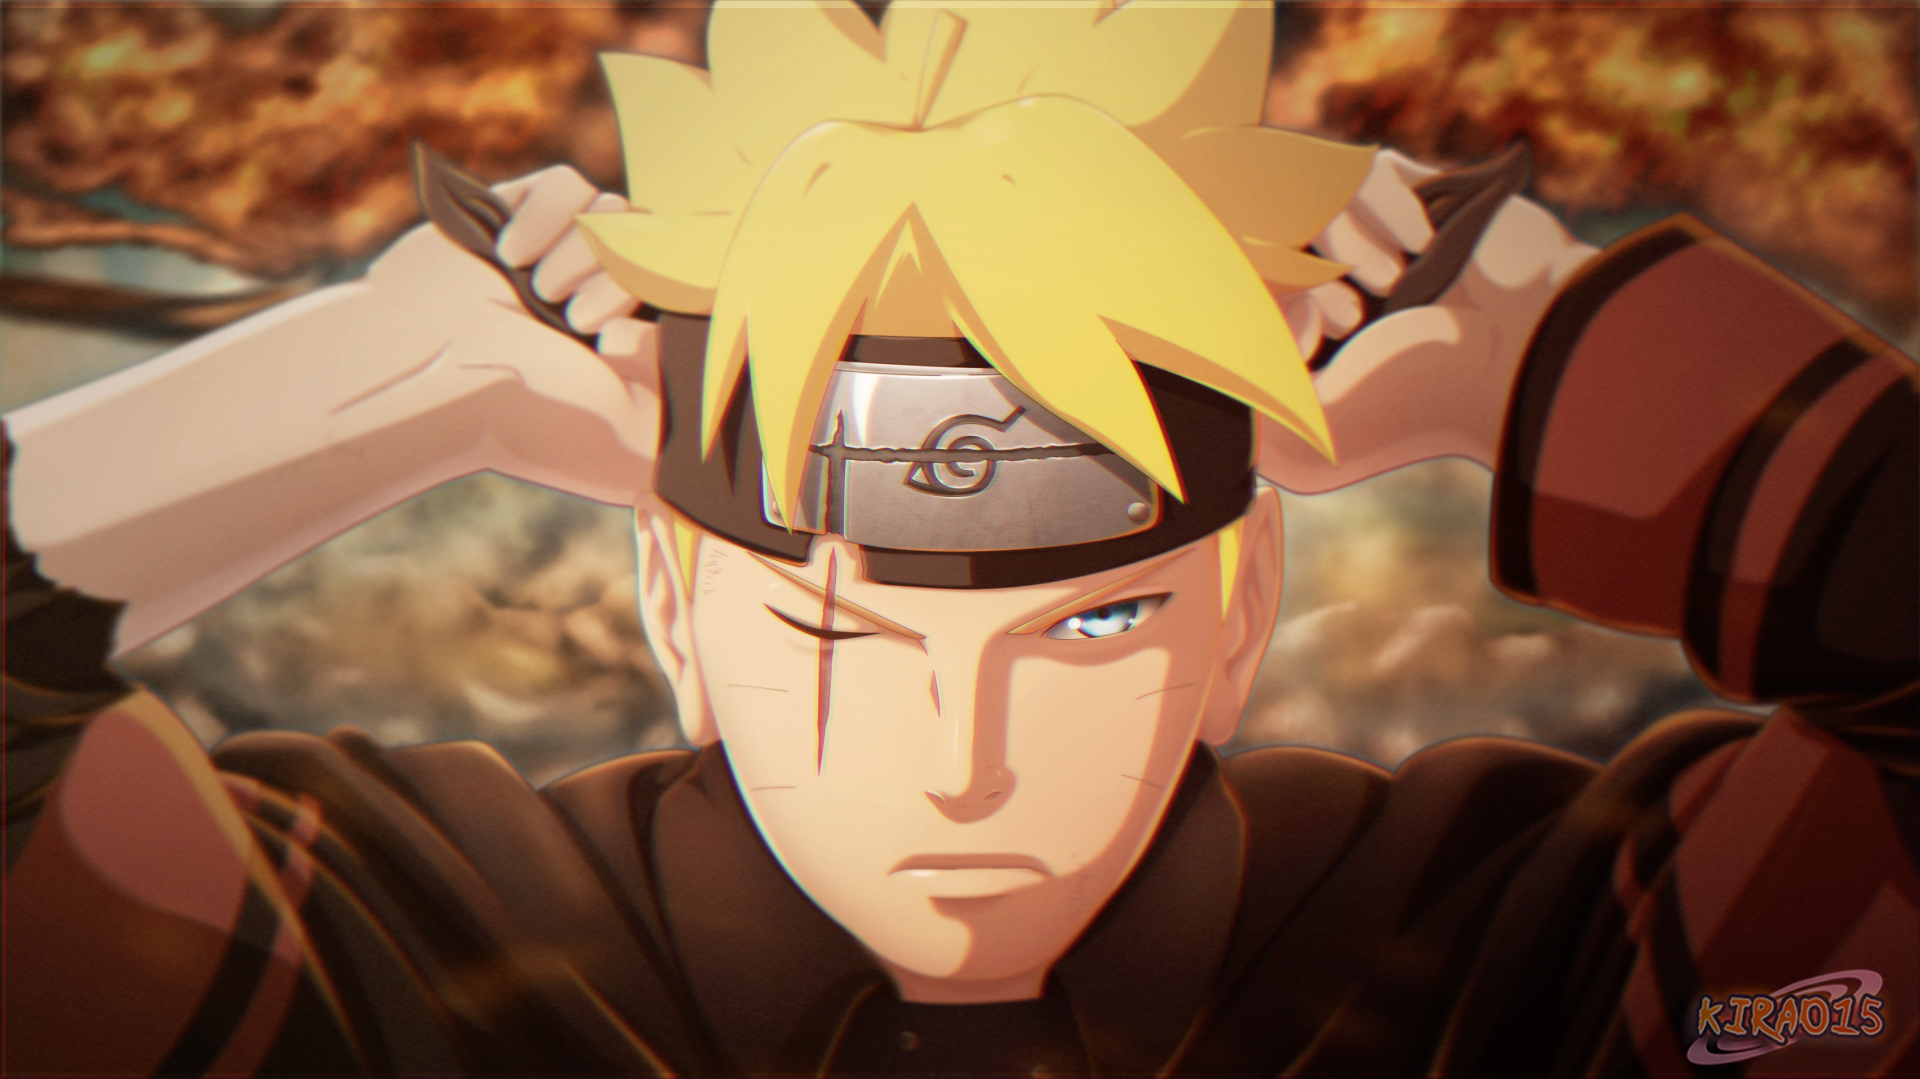 Anime Boruto Boruto Uzumaki Wallpaper Boruto Uzumaki Boruto Wallpaper Naruto Shippuden